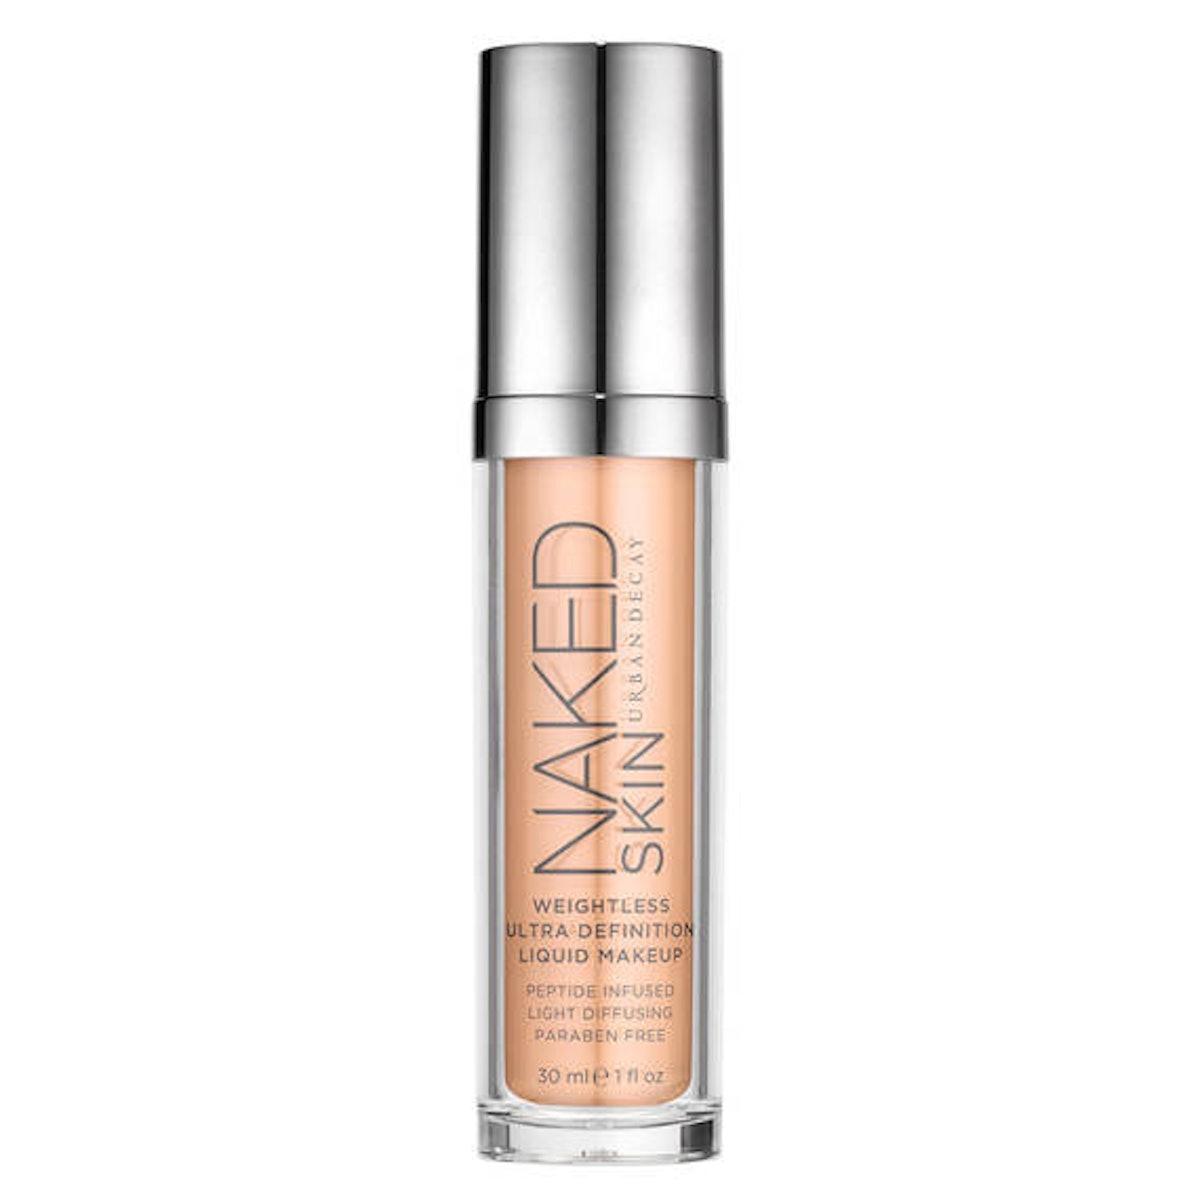 Naked Skin Weightless Ultra Definition Liquid Foundation